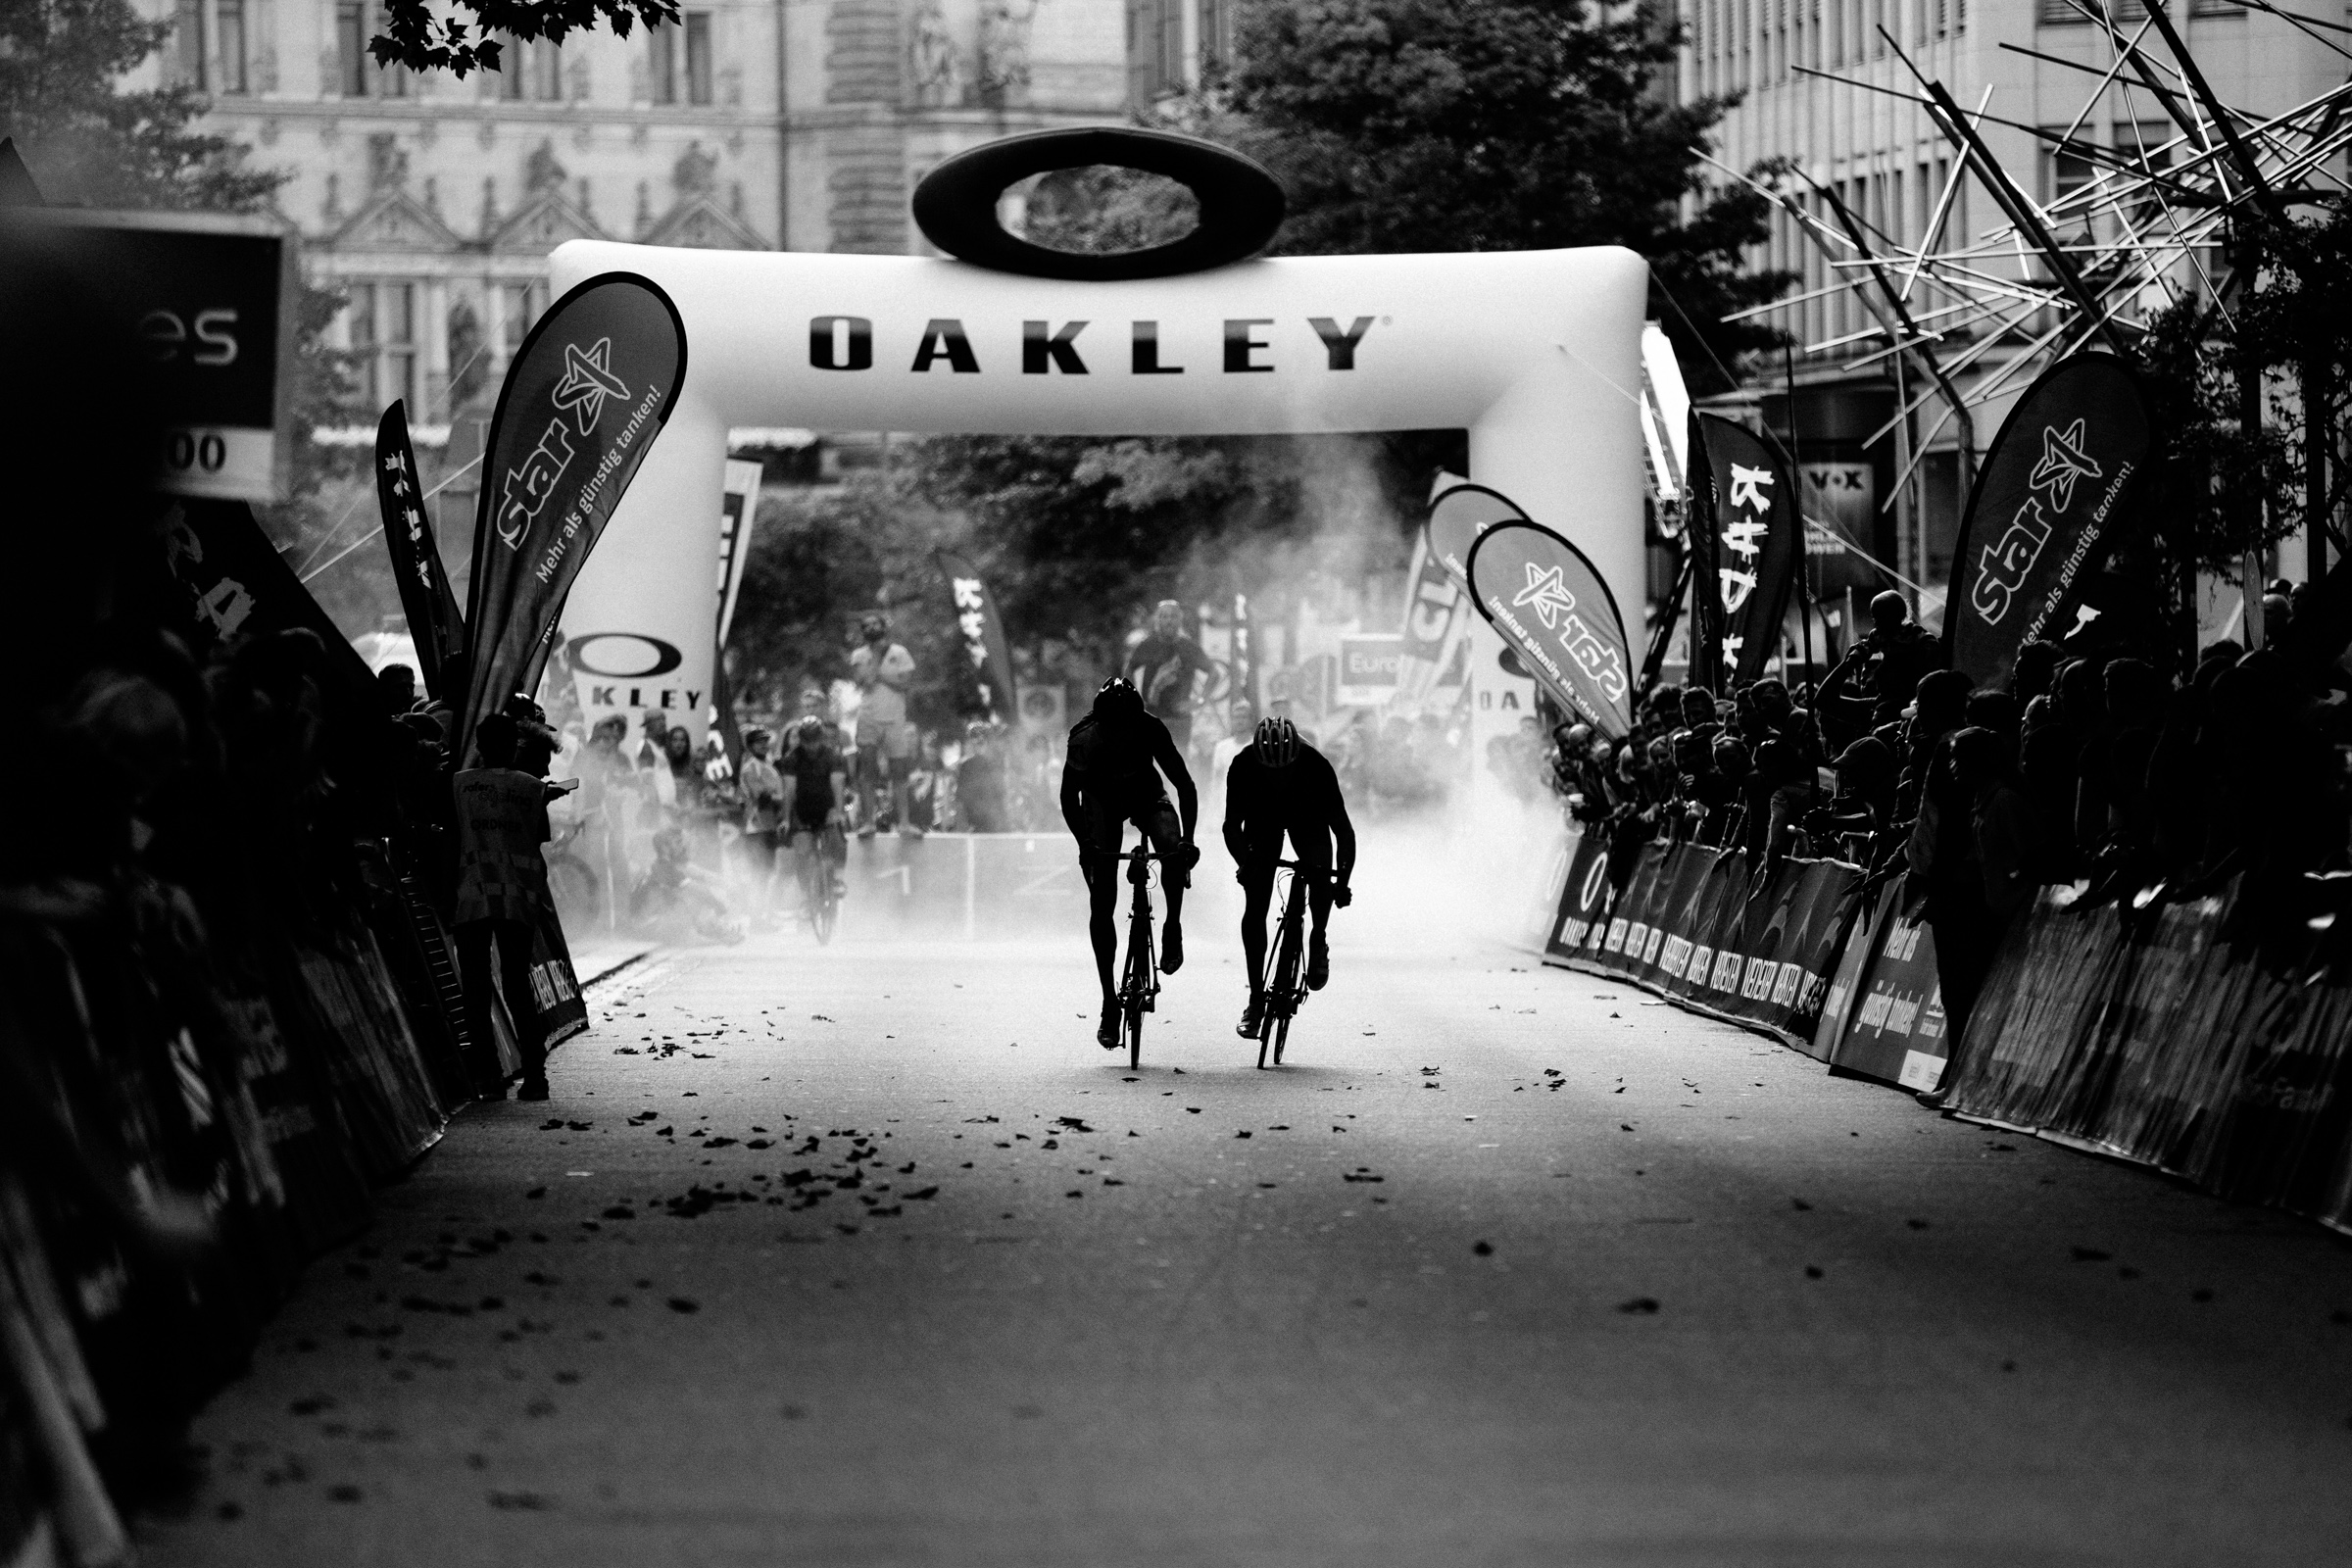 RAD RACE Battle, Berlin May 30 2015 Photo by Bjo?rn Lexius